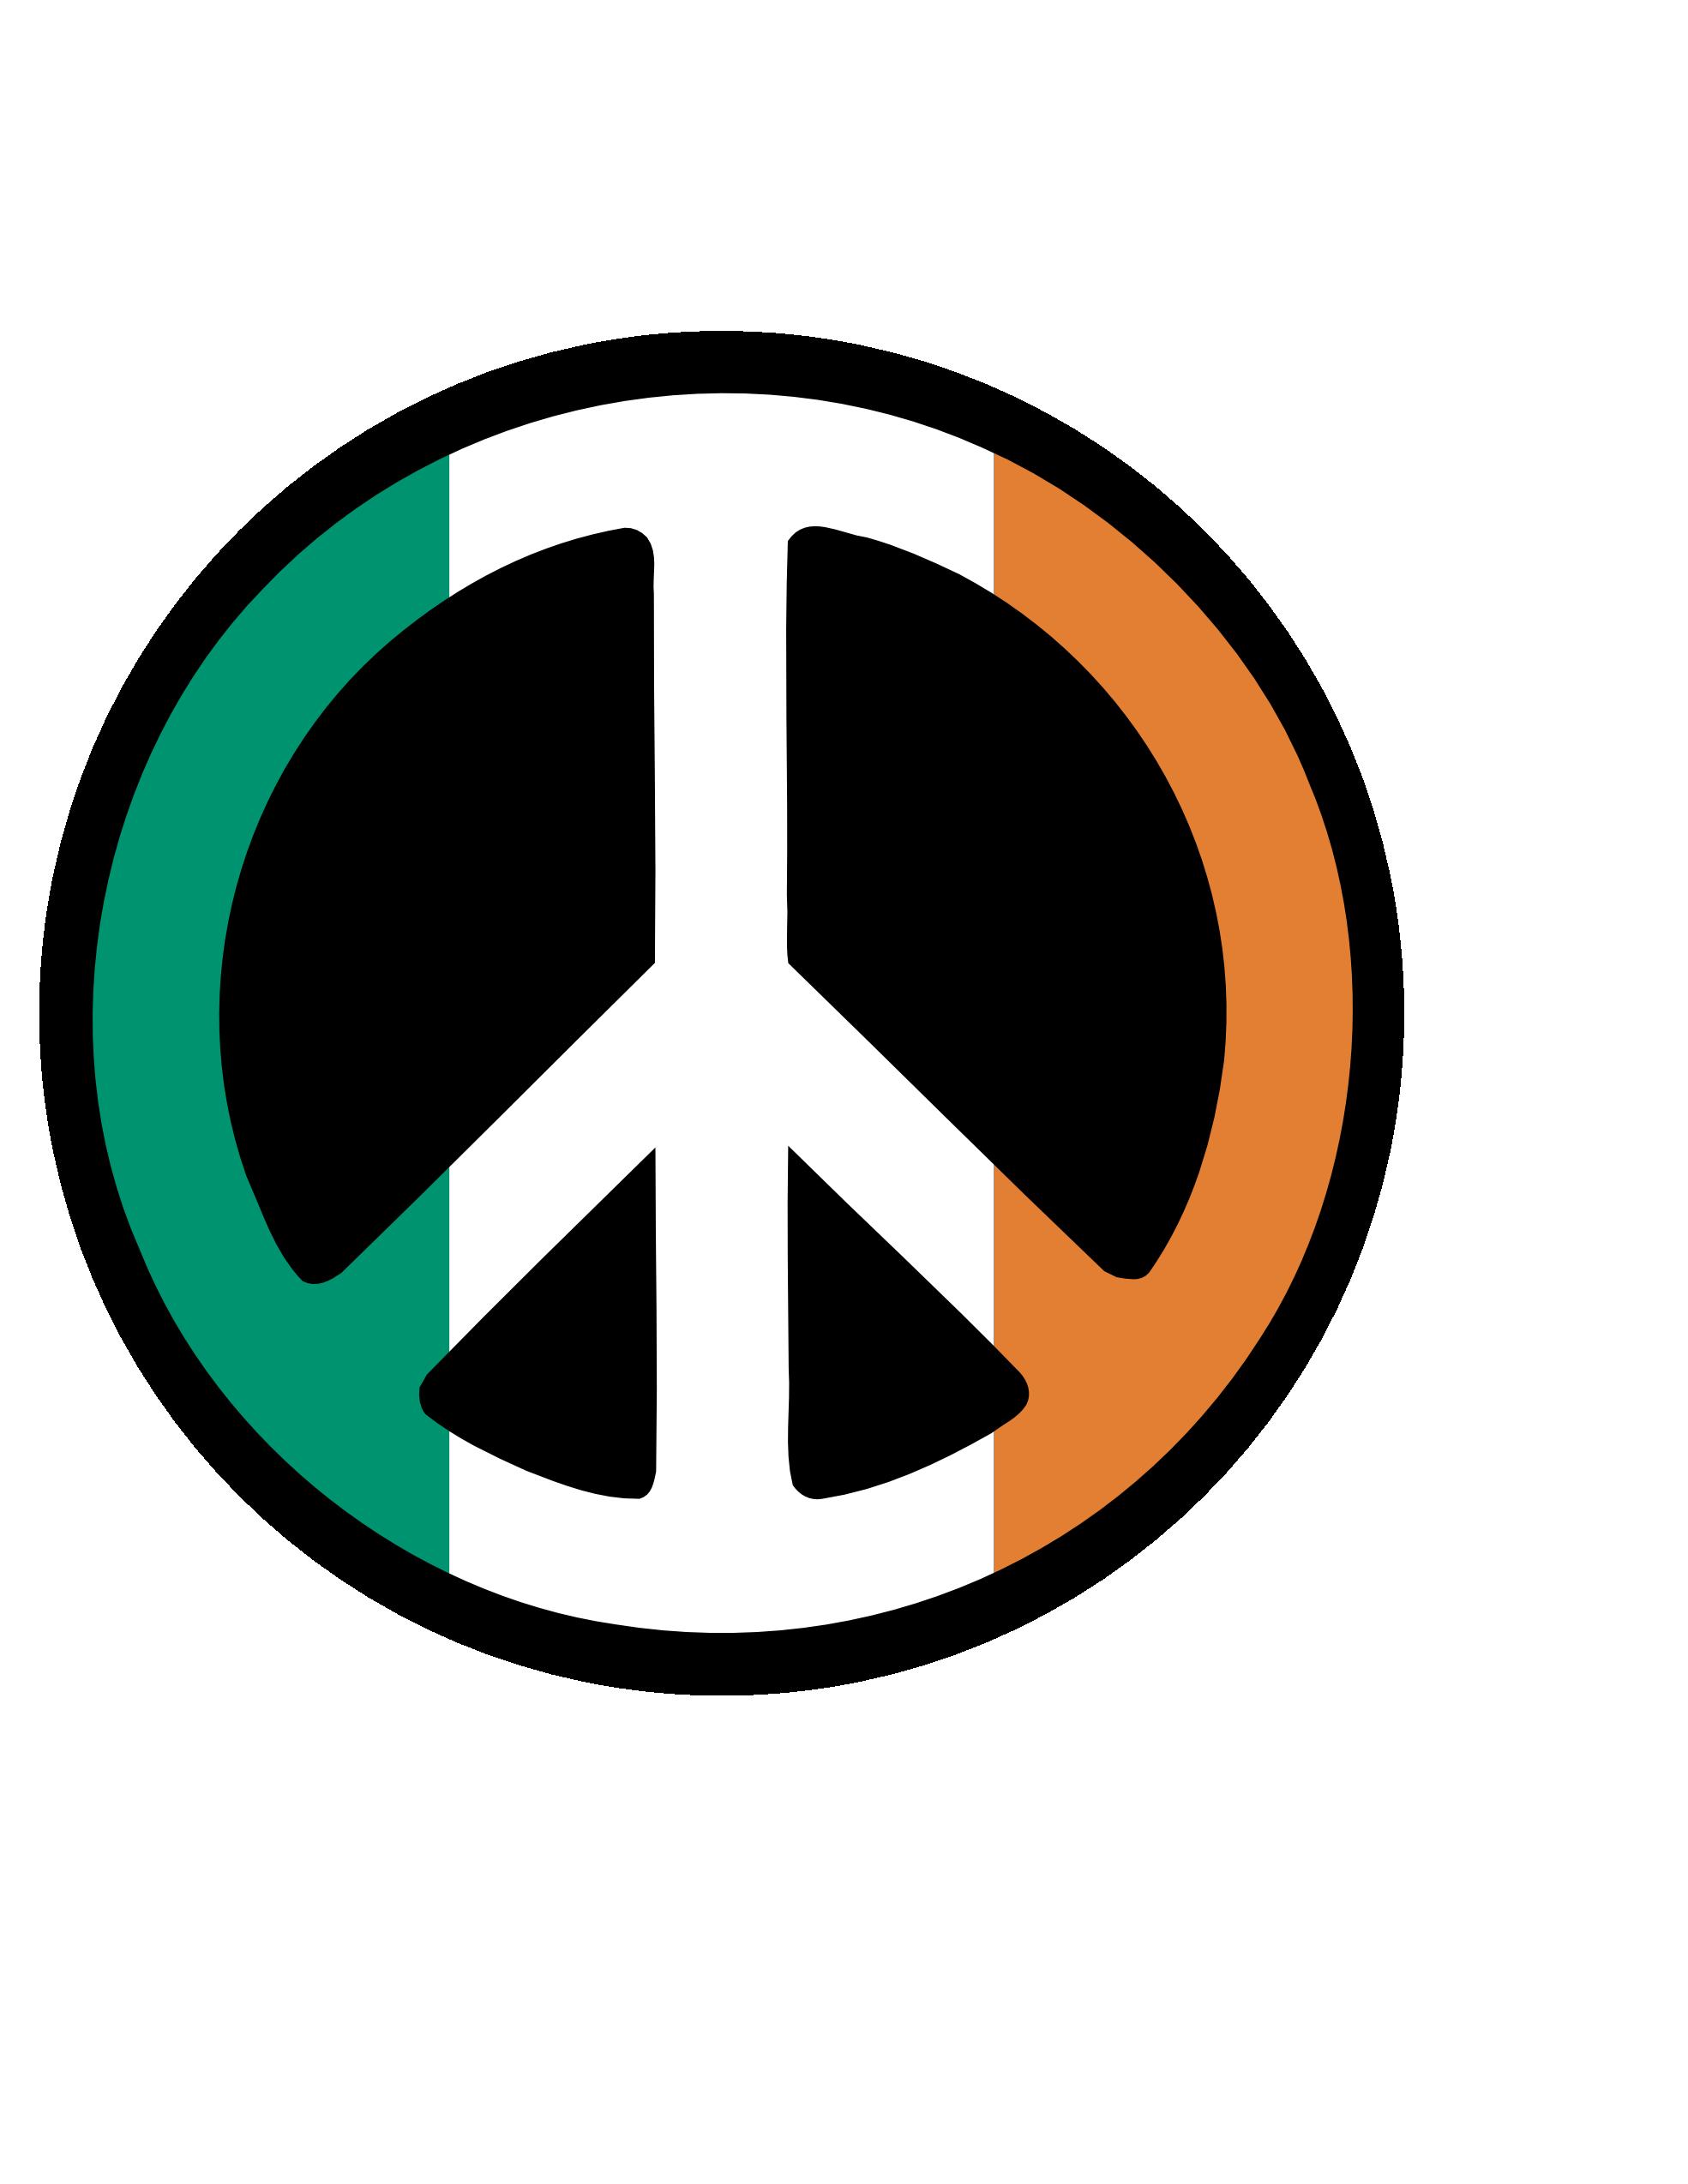 Irish Symbols of Strength and Courage